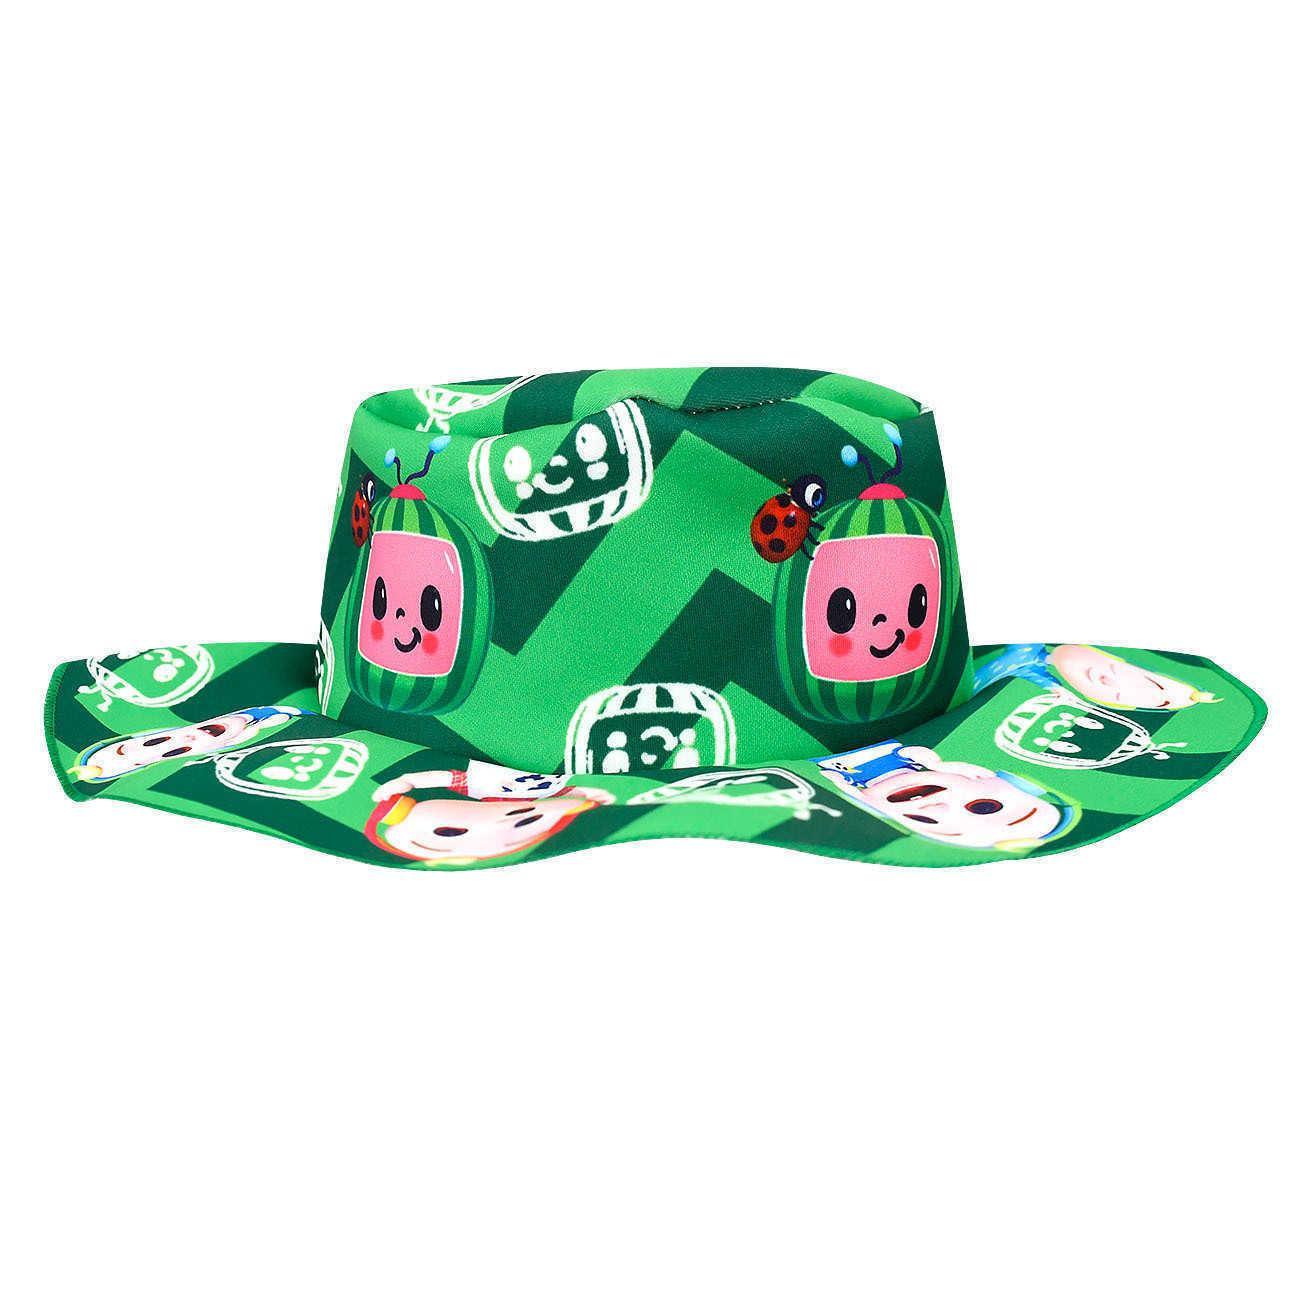 Cartoon Children's Fisherman Hat Cocomelon JJ Boys Girls Sun Hat Colorful Fashion Cute Printed Baby bucket hats Kids Baby Outdoor Visor Sunhat Gifts G82ETPO